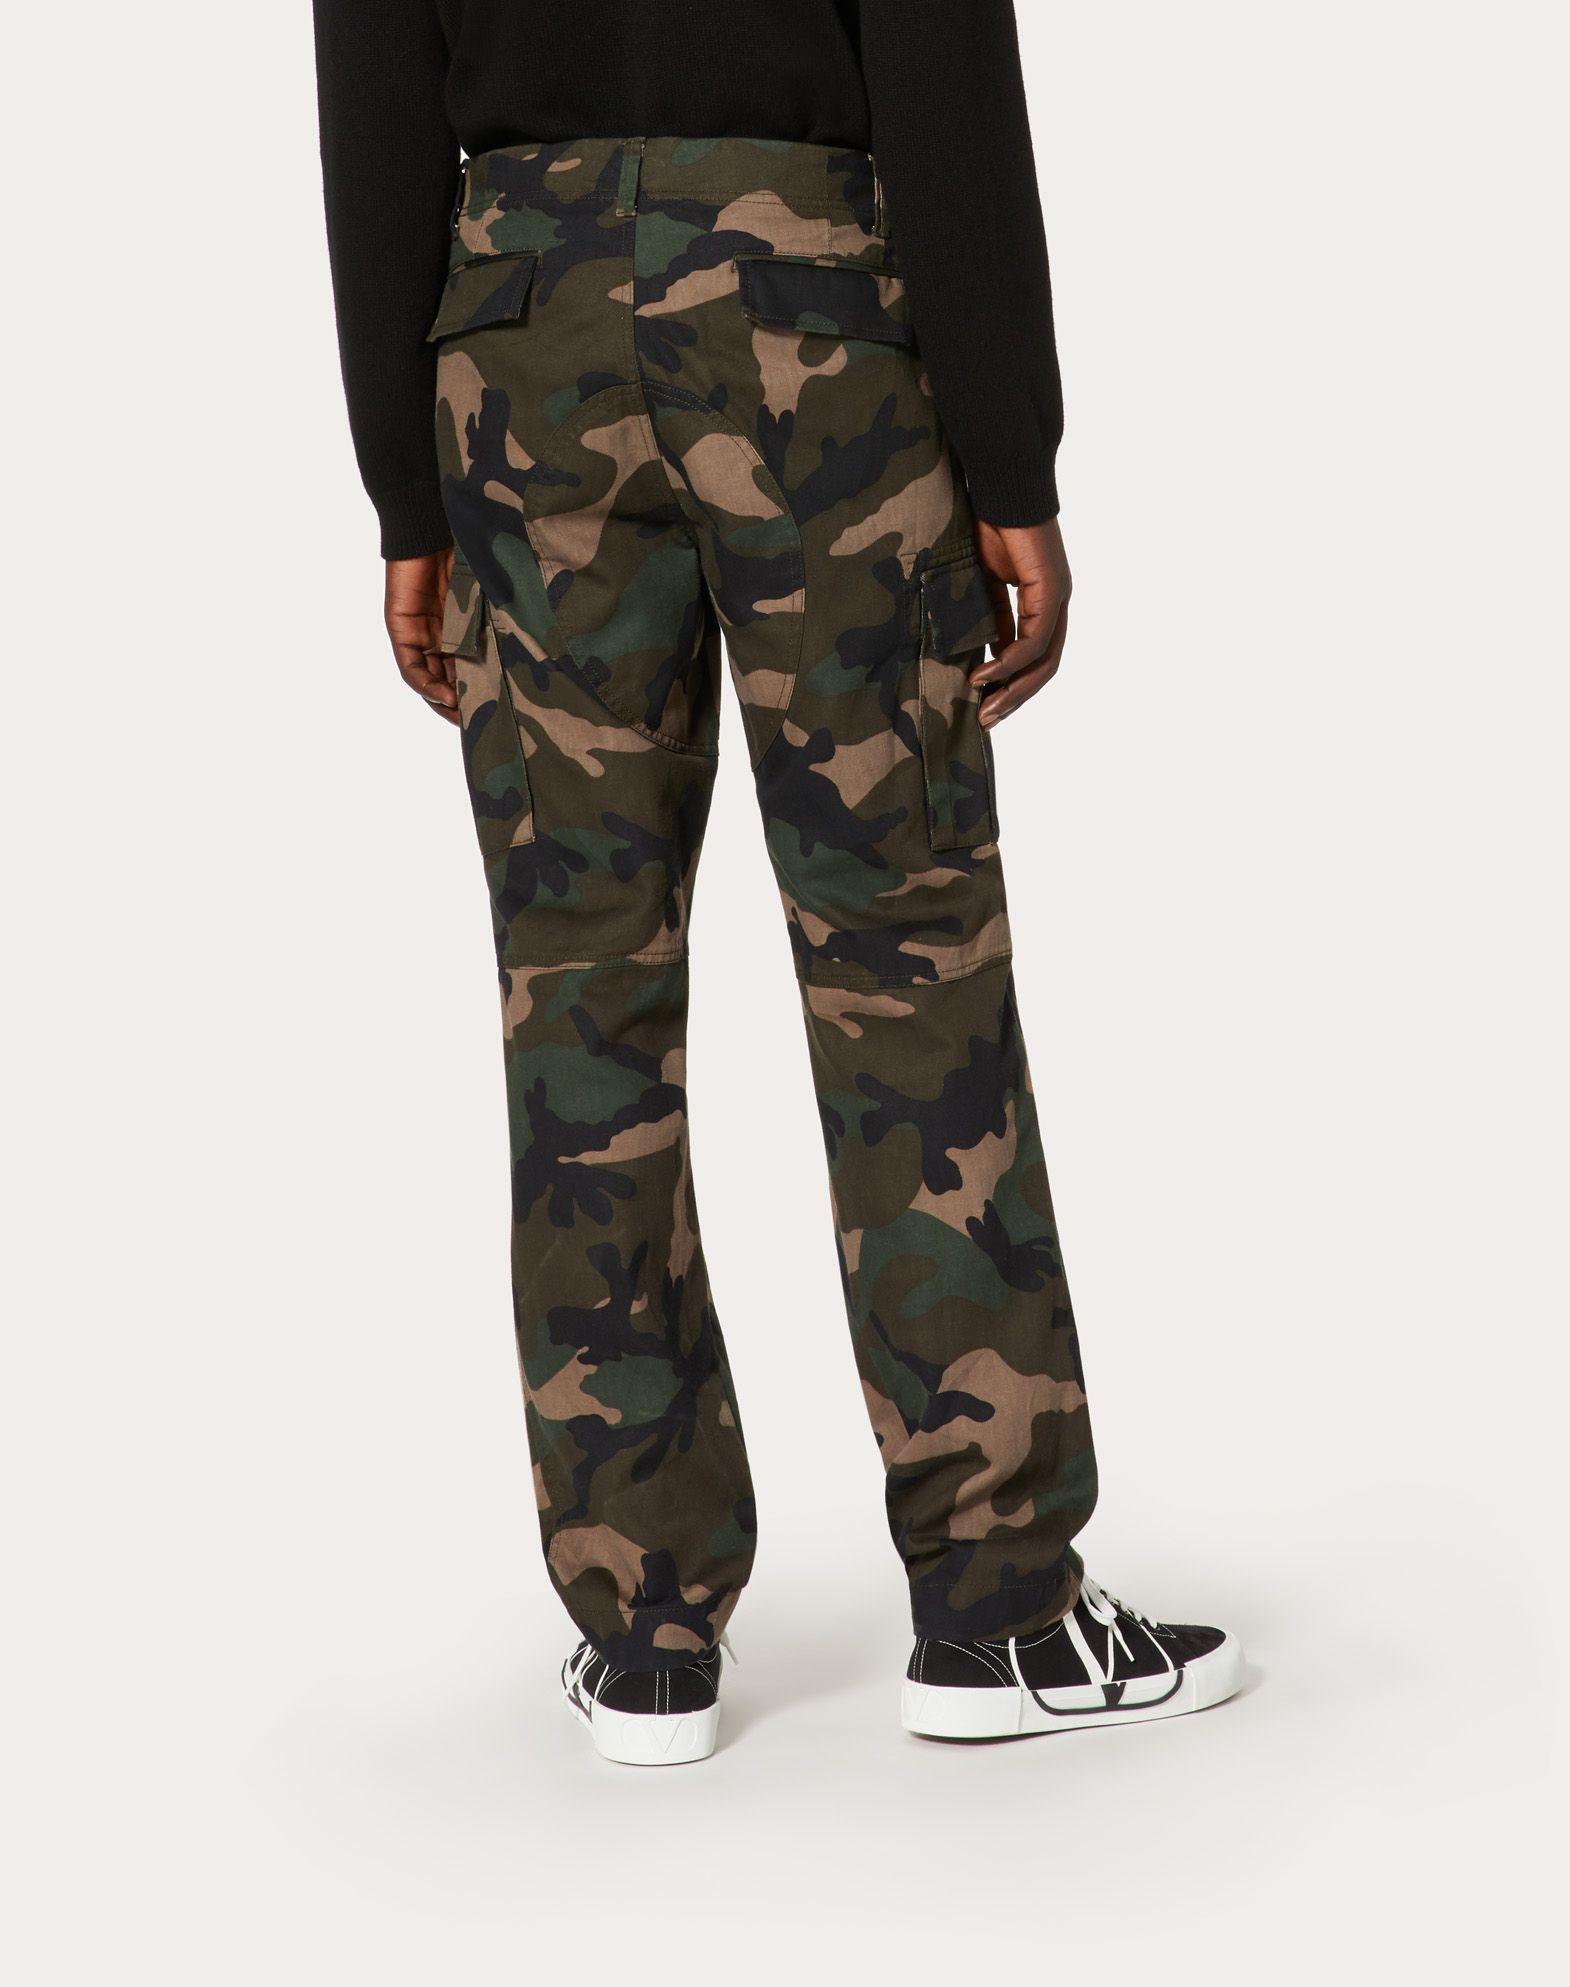 VALENTINO UOMO Camouflage cargo pants Trousers U e